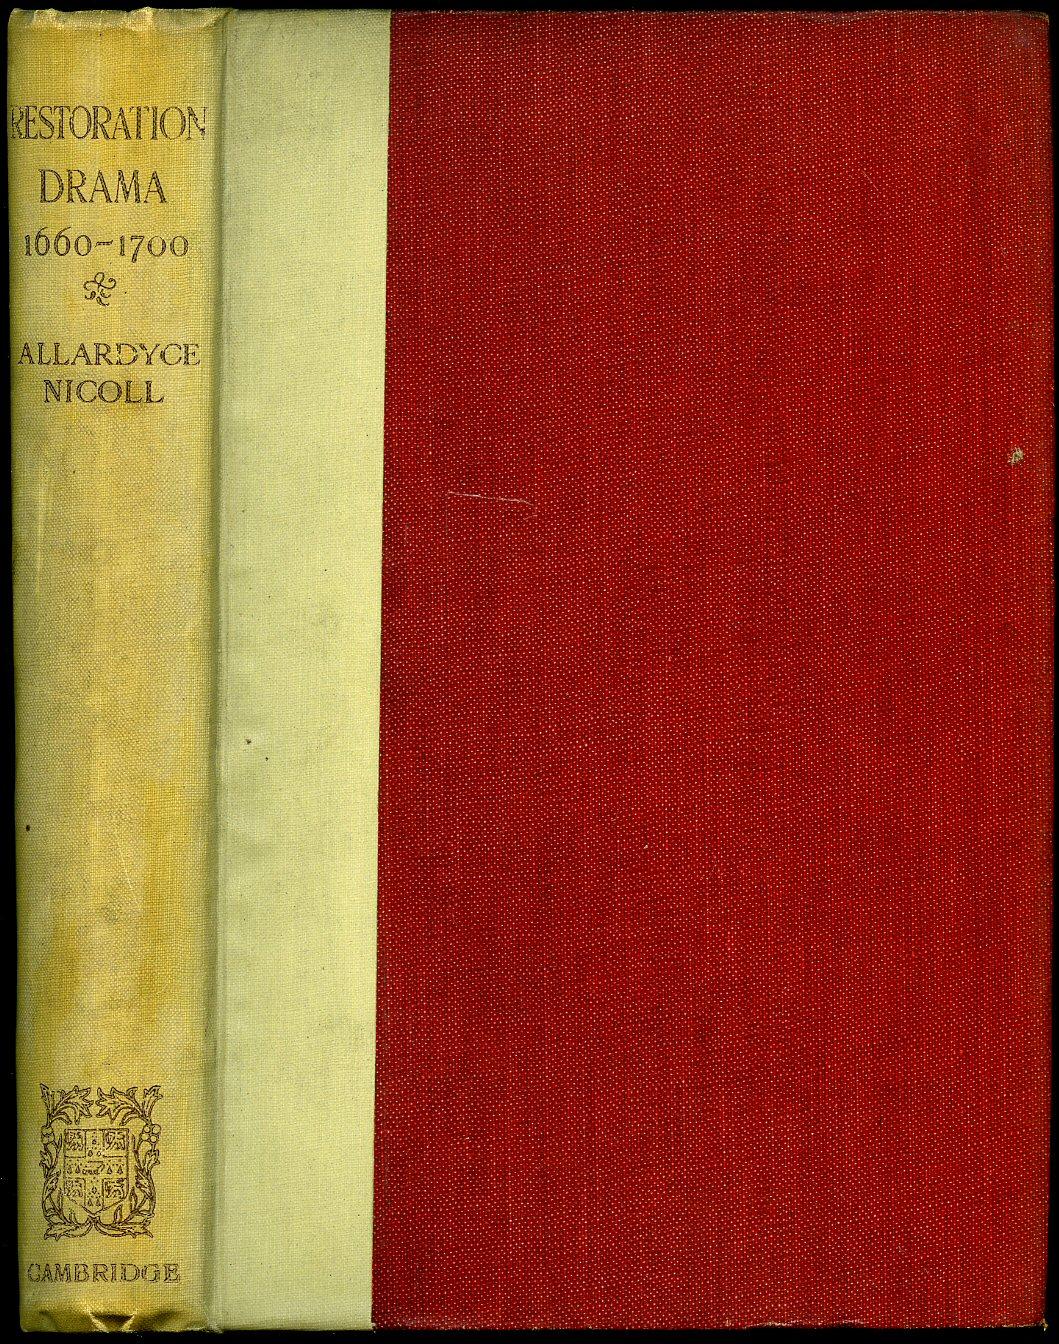 NICOLL, ALLARDYCE [JOHN RAMSAY ALLARDYCE NICOLL (28 JUNE 1894 - 17 APRIL 1976) WAS A BRITISH LITERARY SCHOLAR, TEACHER, AND FOUNDING DIRECTOR OF THE SHAKESPEARE INSTITUTE AT BIRMINGHAM. HIS MAJOR WORK WAS THIS SIX-VOLUME HISTORY OF ENGLISH DRAMA, 1660-190 - A History of Restoration Drama 1660-1700